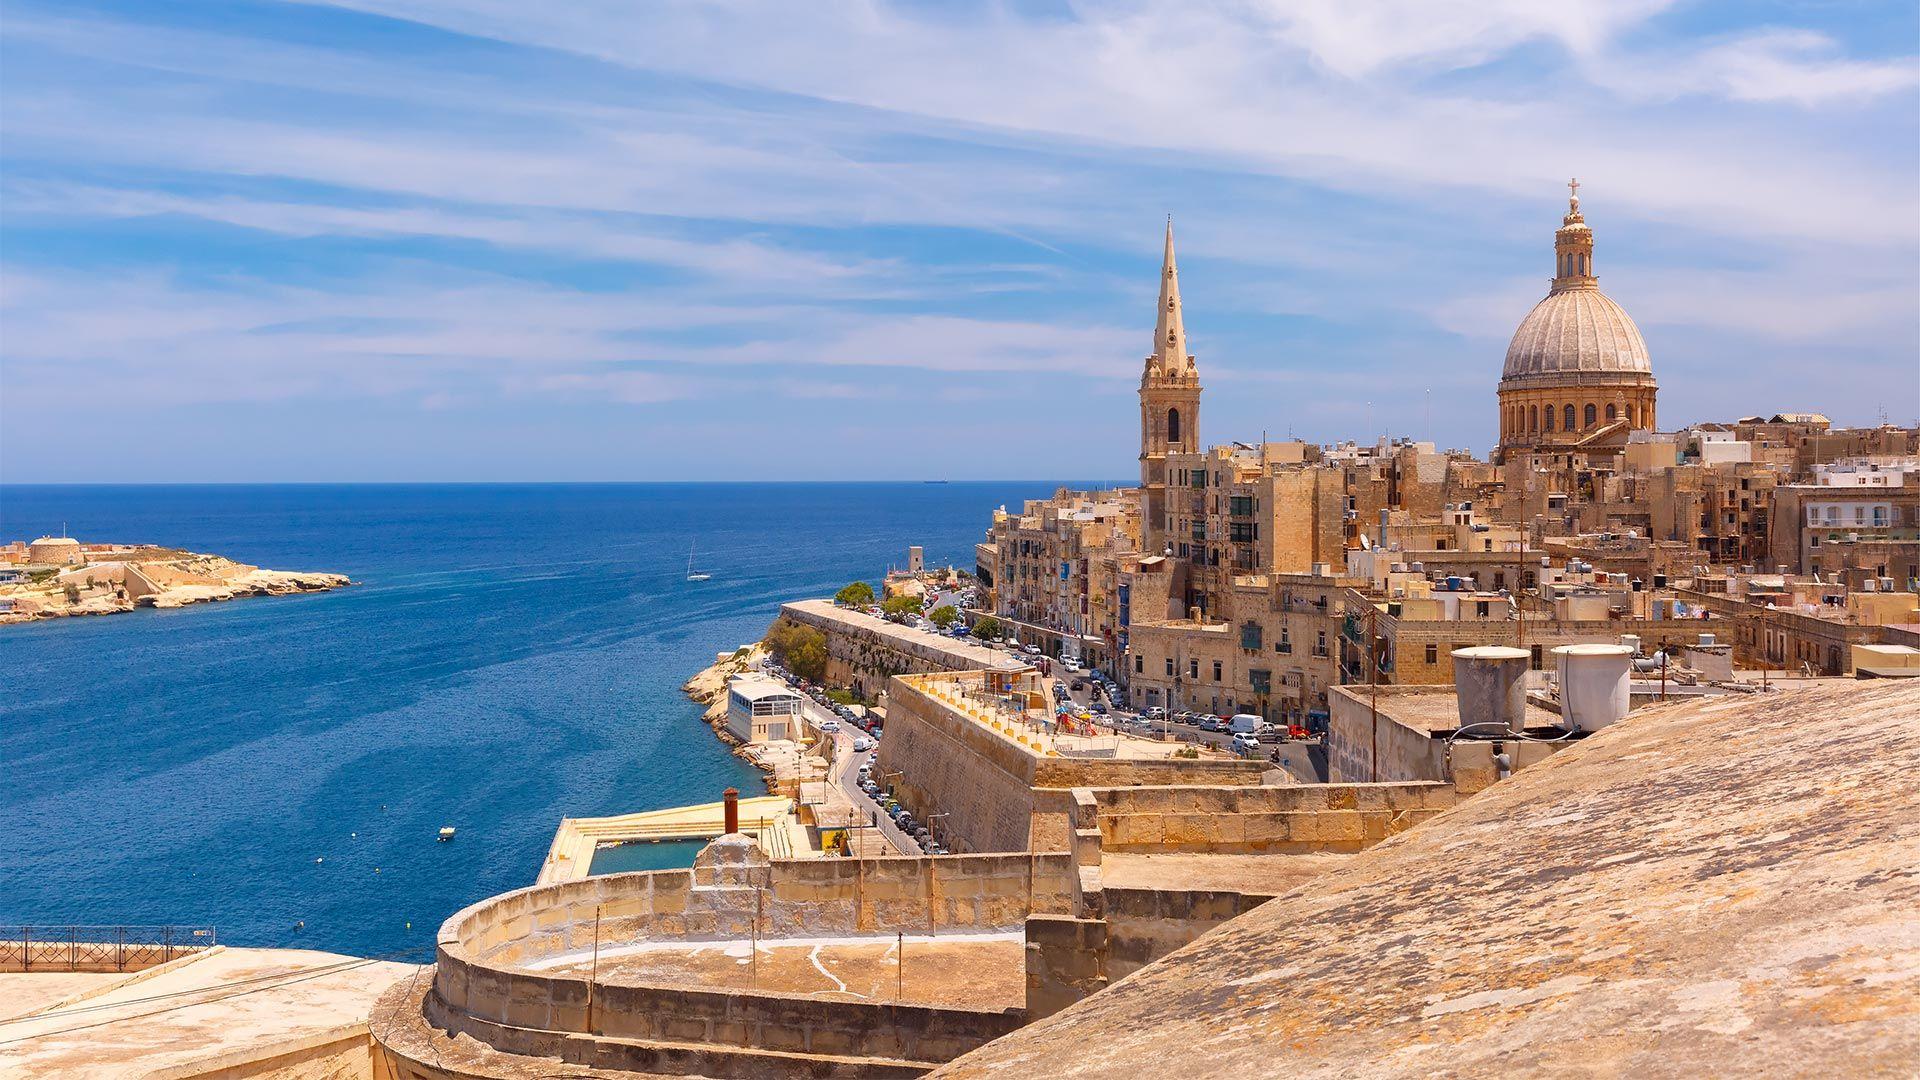 Circuit de grup - Essential Malta, 8 zile